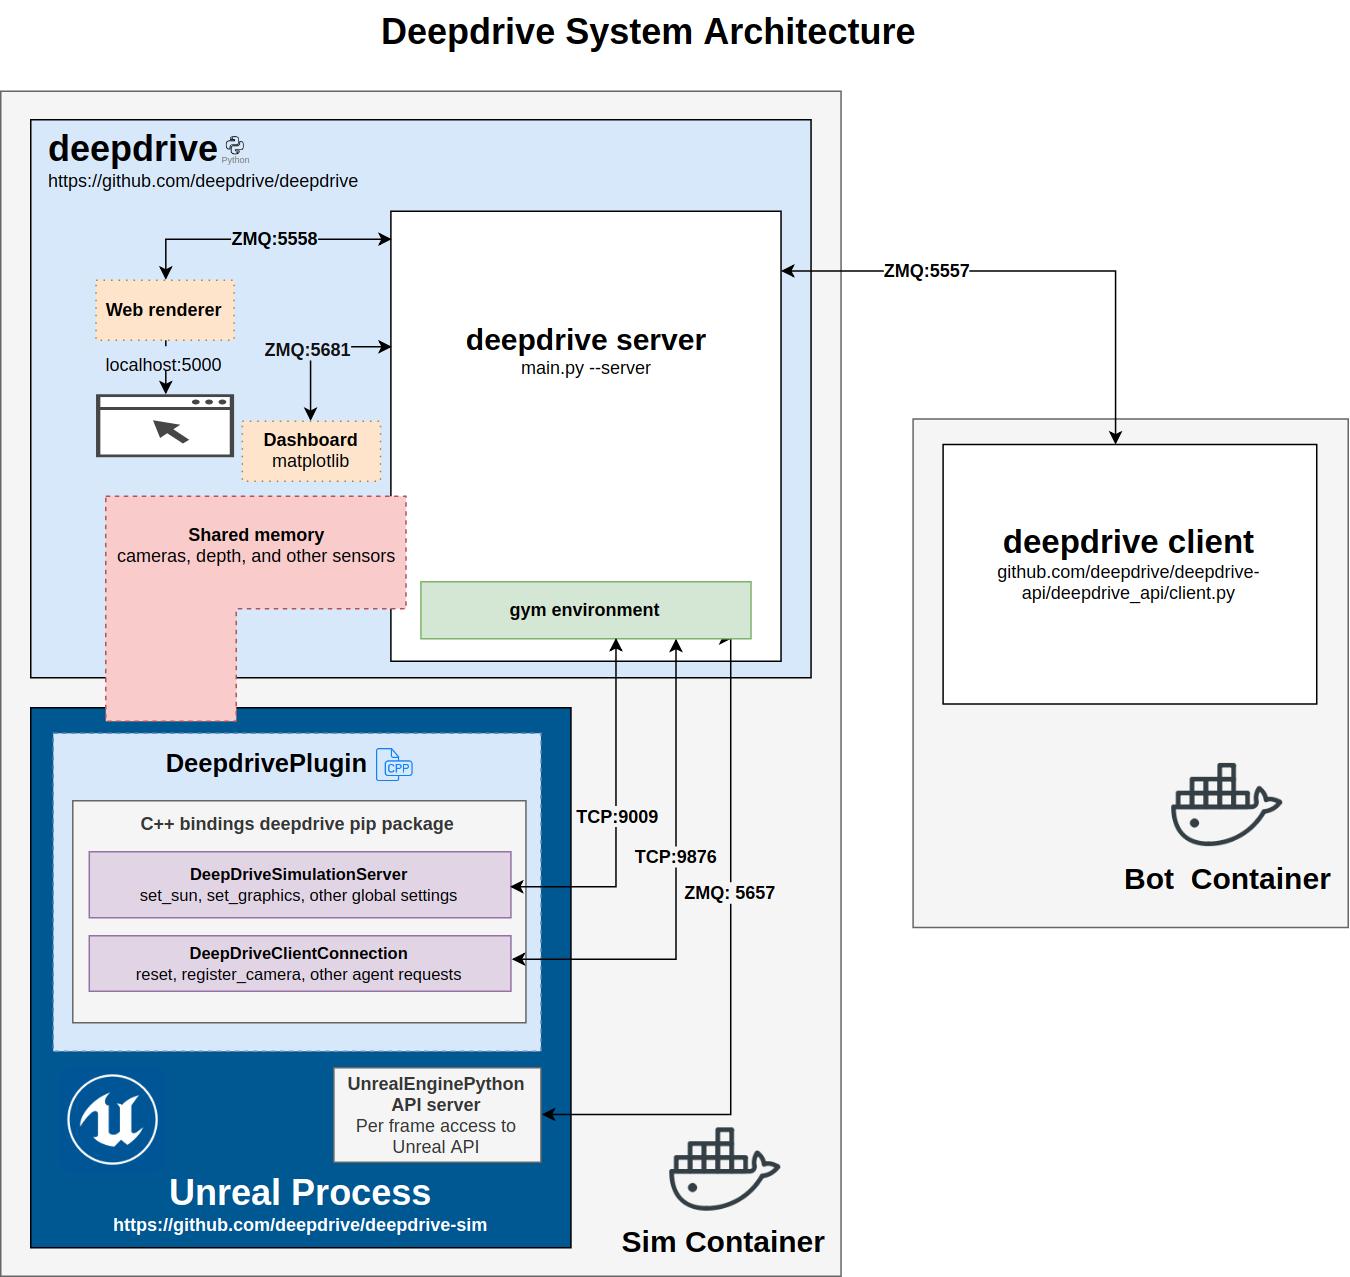 Deepdrive Architecture